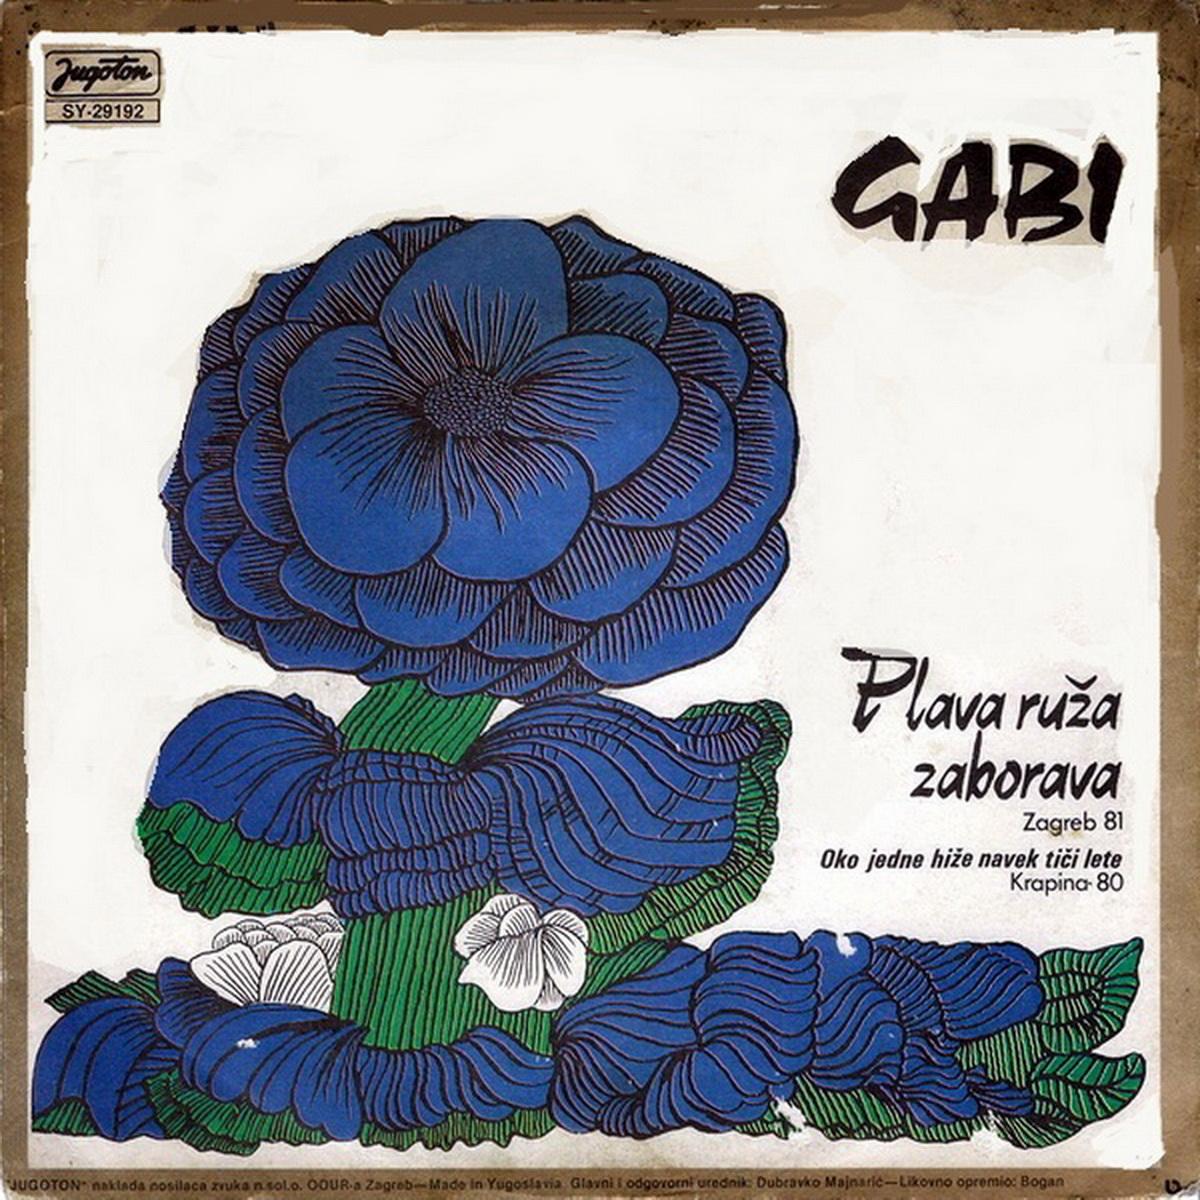 Gabi Novak 1981 Plava ruza zaborava A